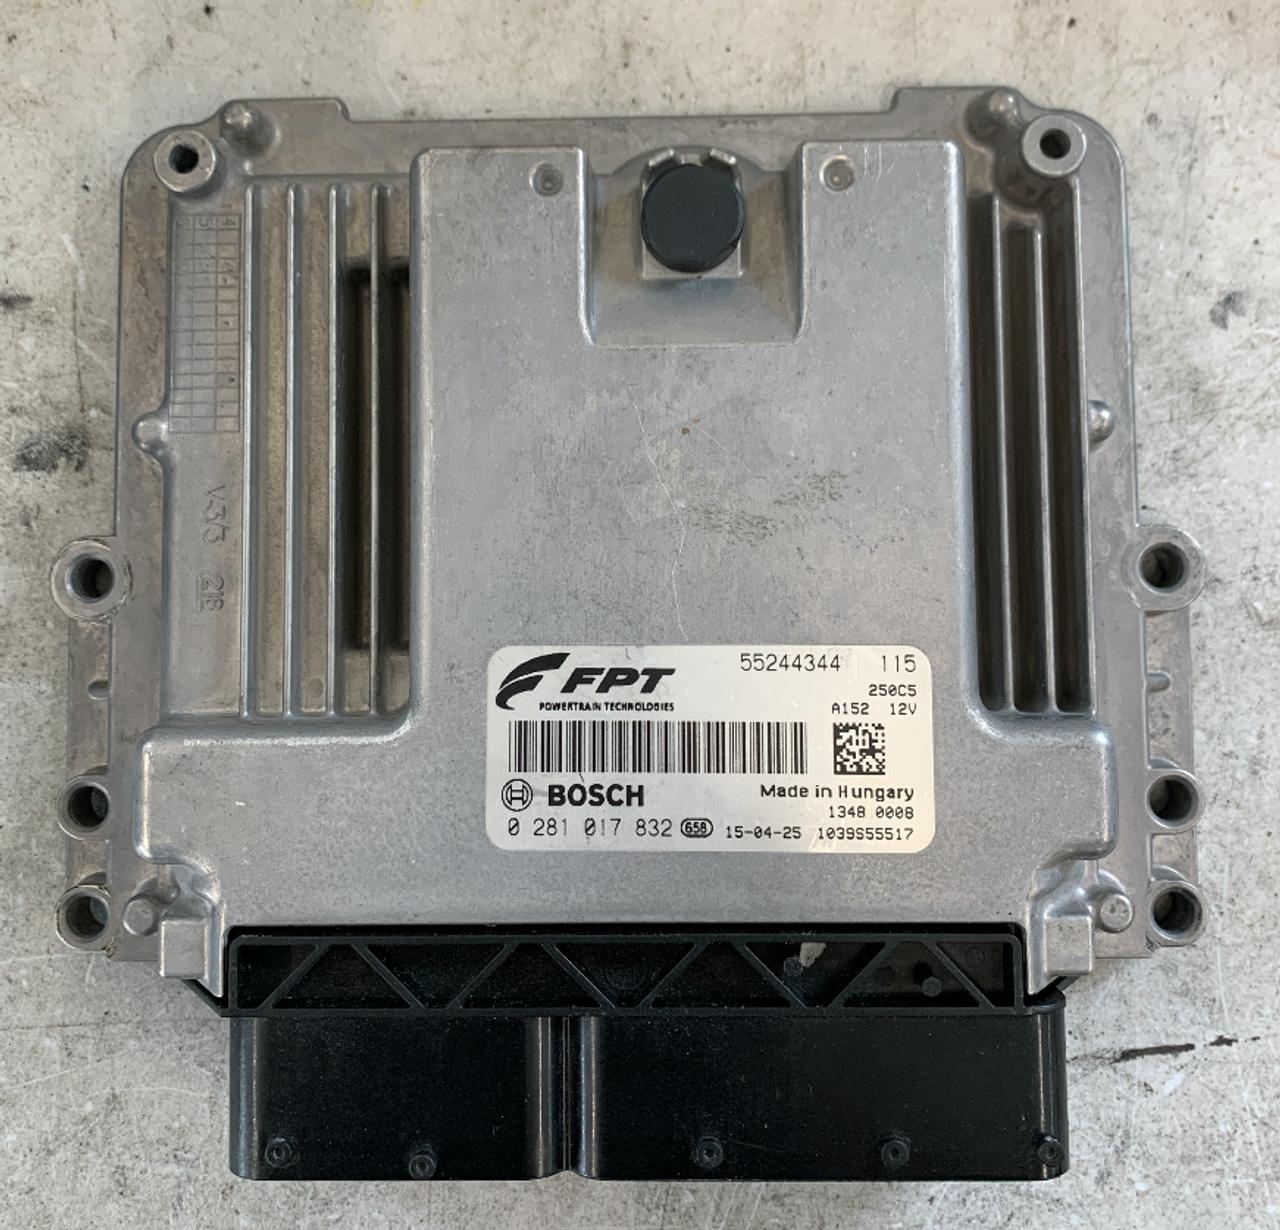 Bosch Engine ECU, Fiat Ducato 115, 0281017832, 0 281 017 832, 55244344, 1039S55517